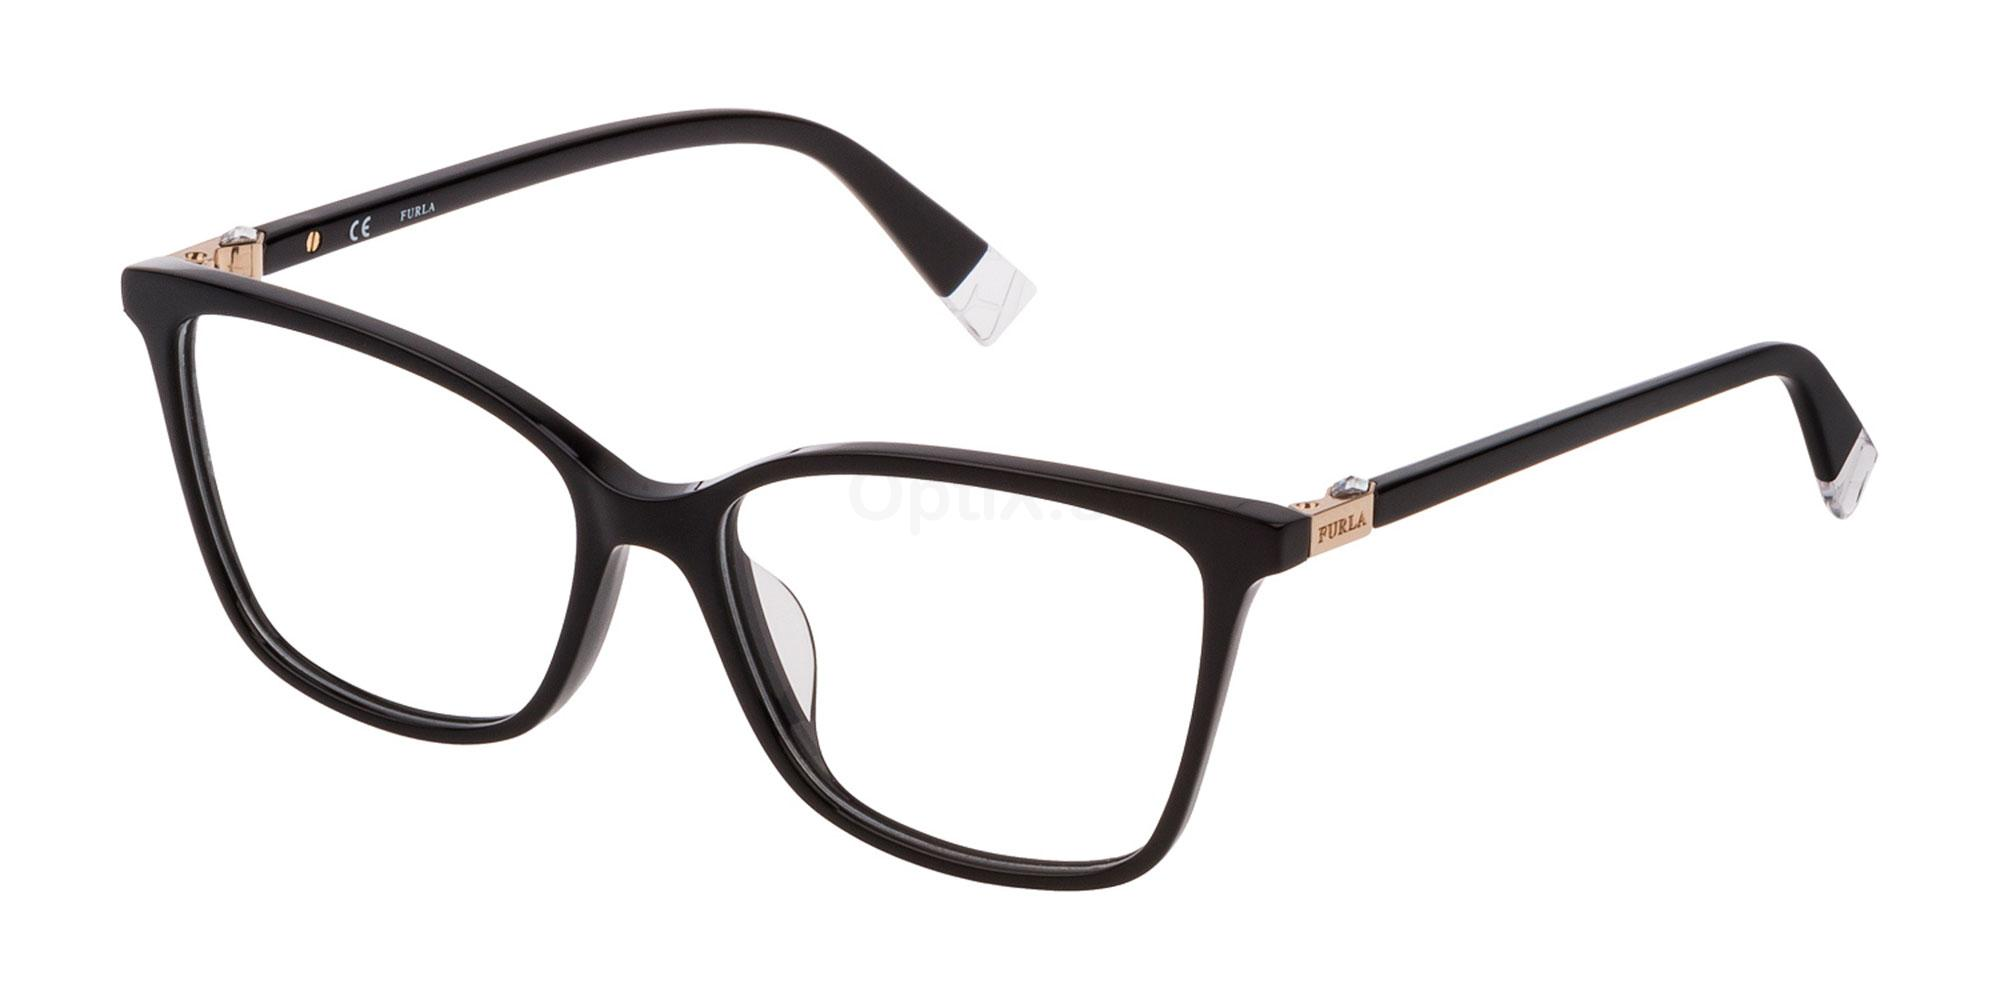 0700 VFU295S Glasses, Furla